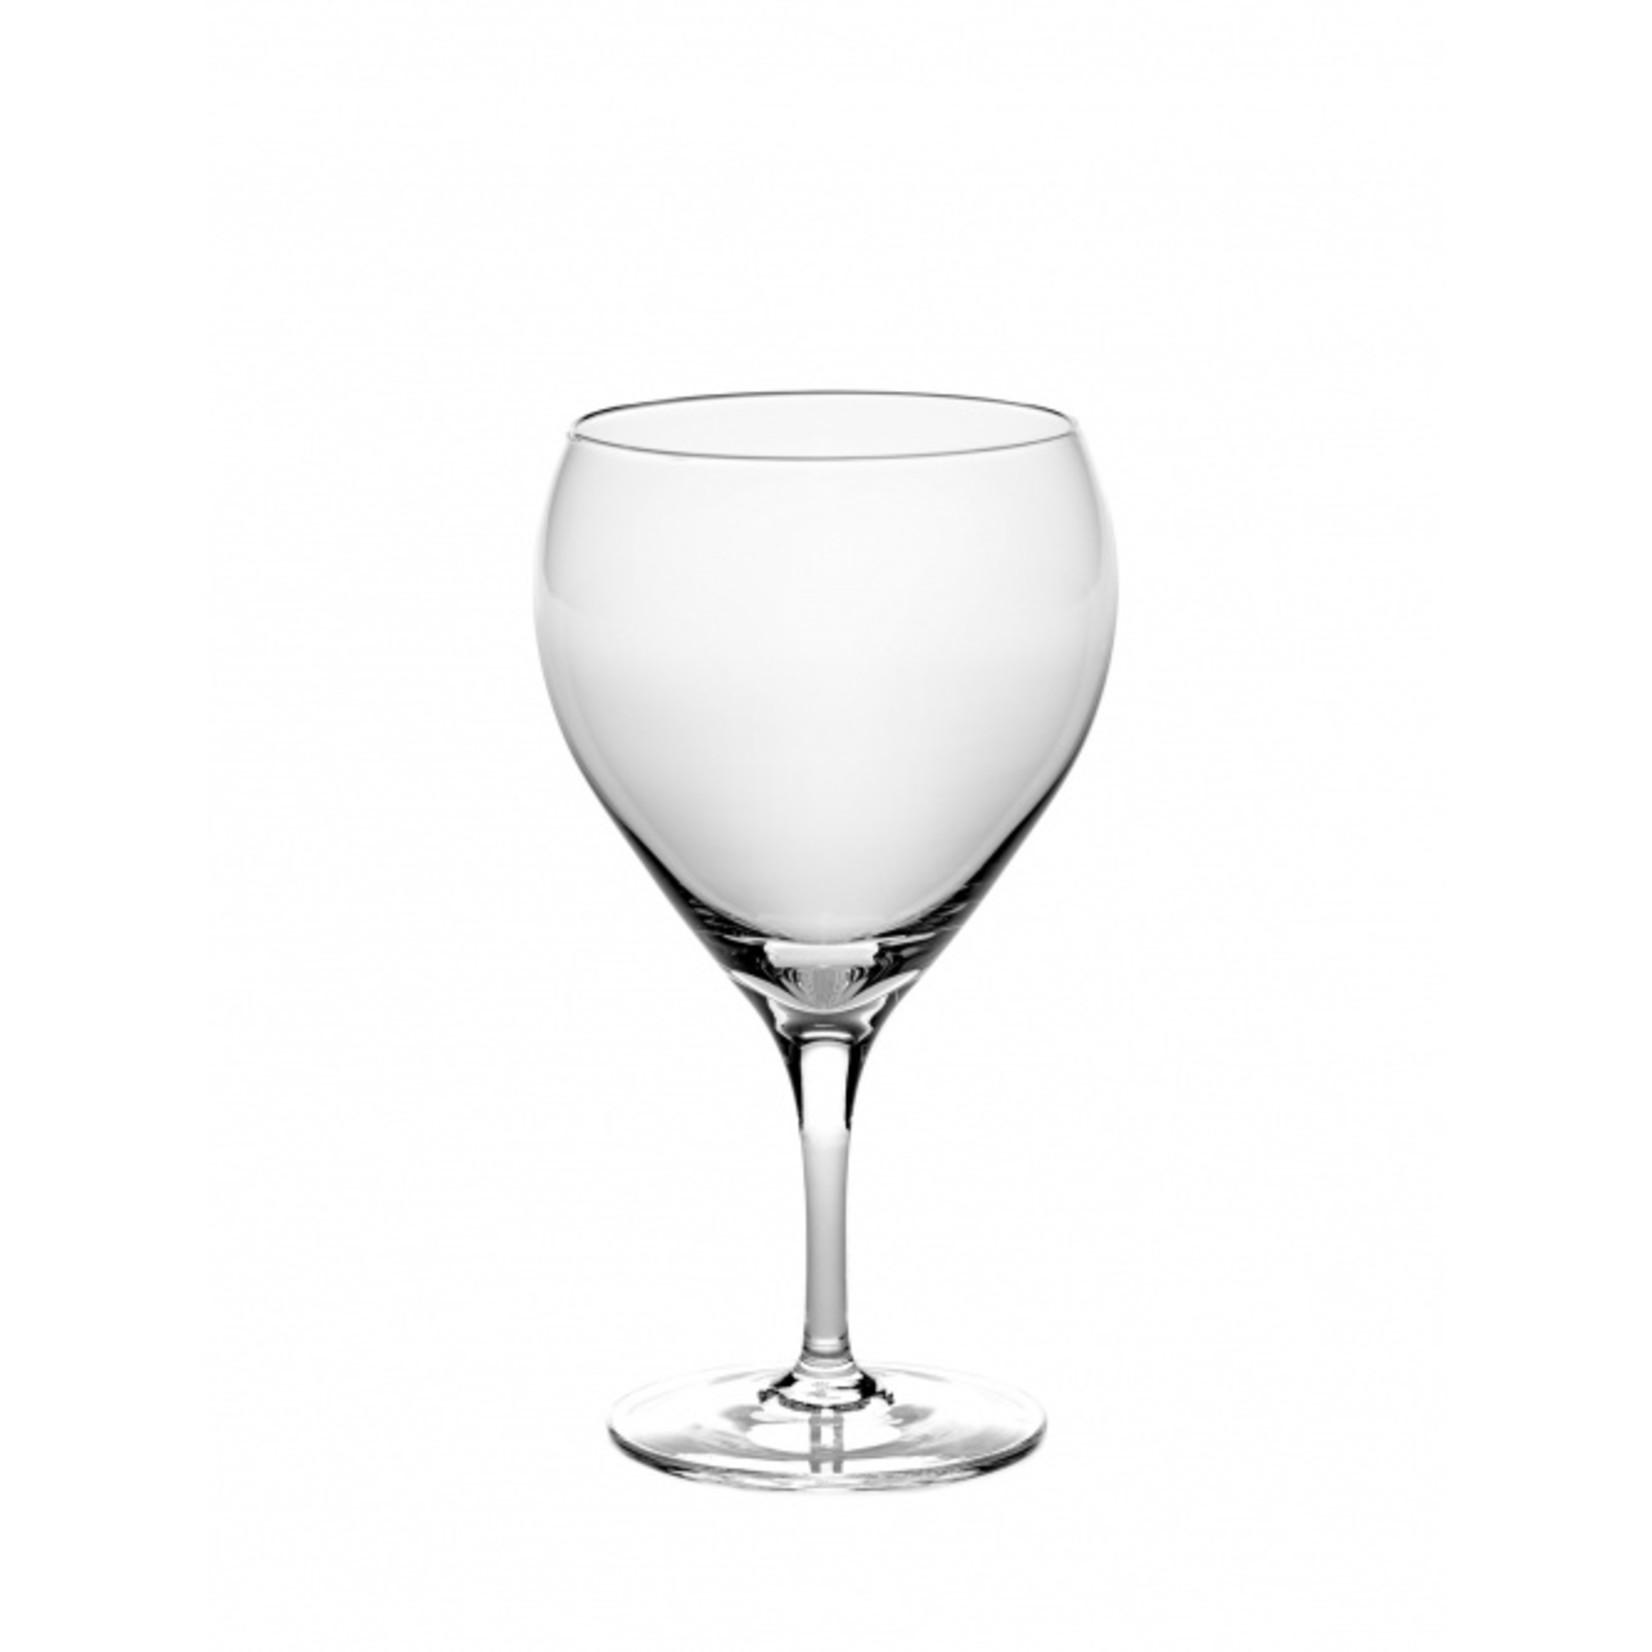 Sergio Herman Inku Champagne glas Inku